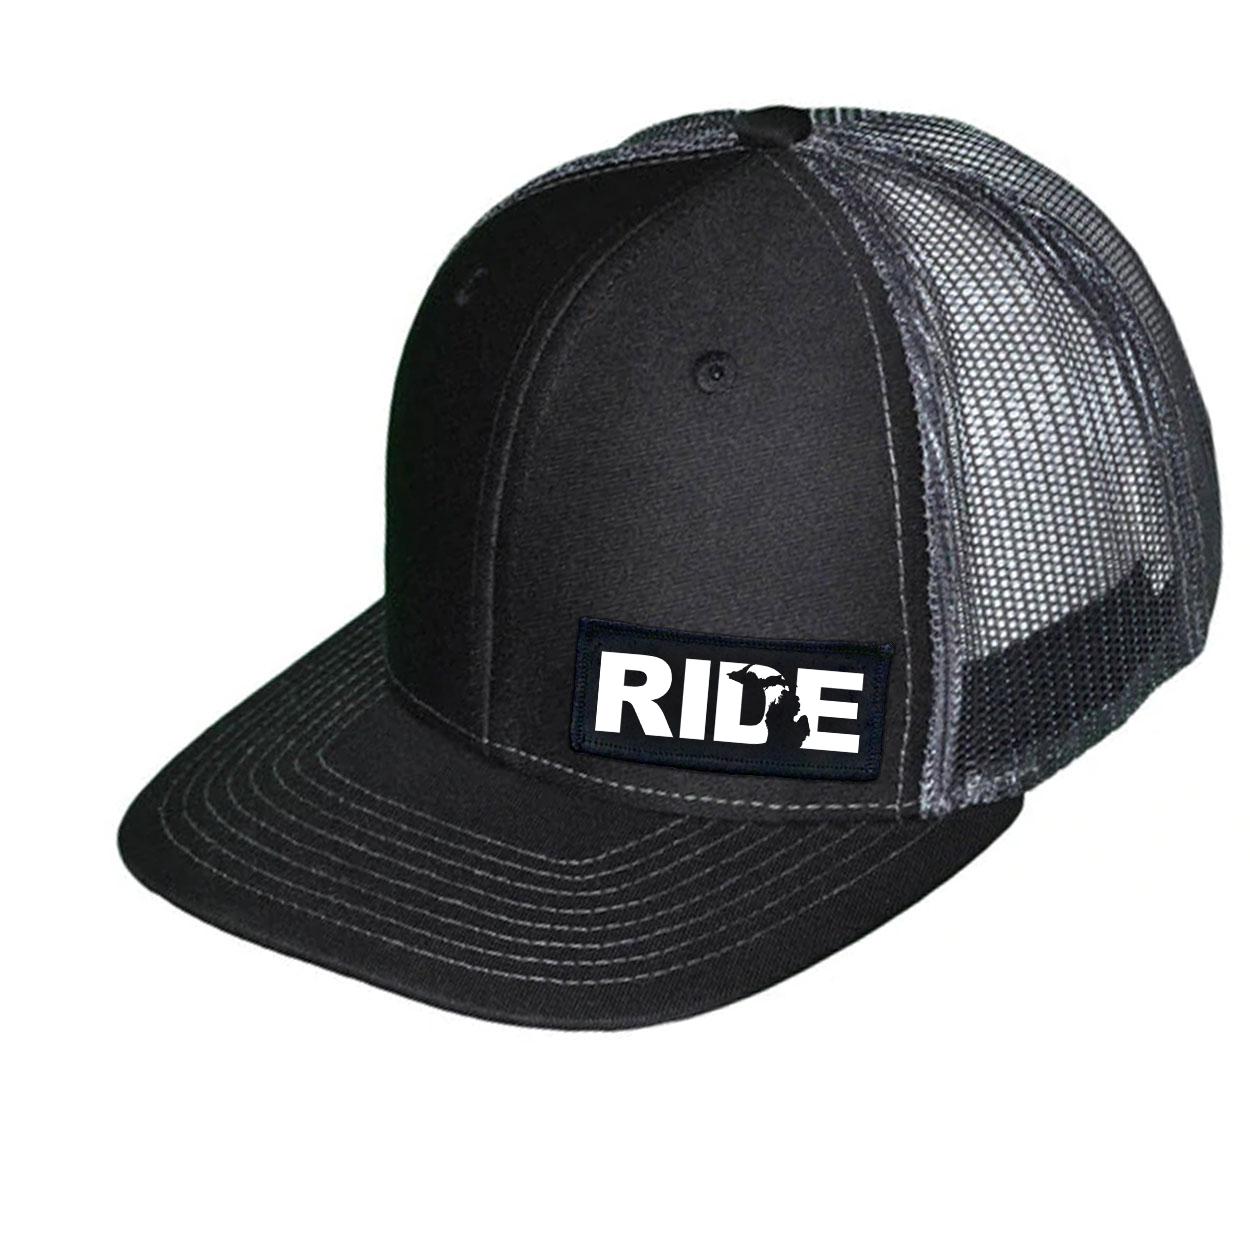 Ride Michigan Night Out Woven Patch Snapback Trucker Hat Black/Dark Gray (White Logo)